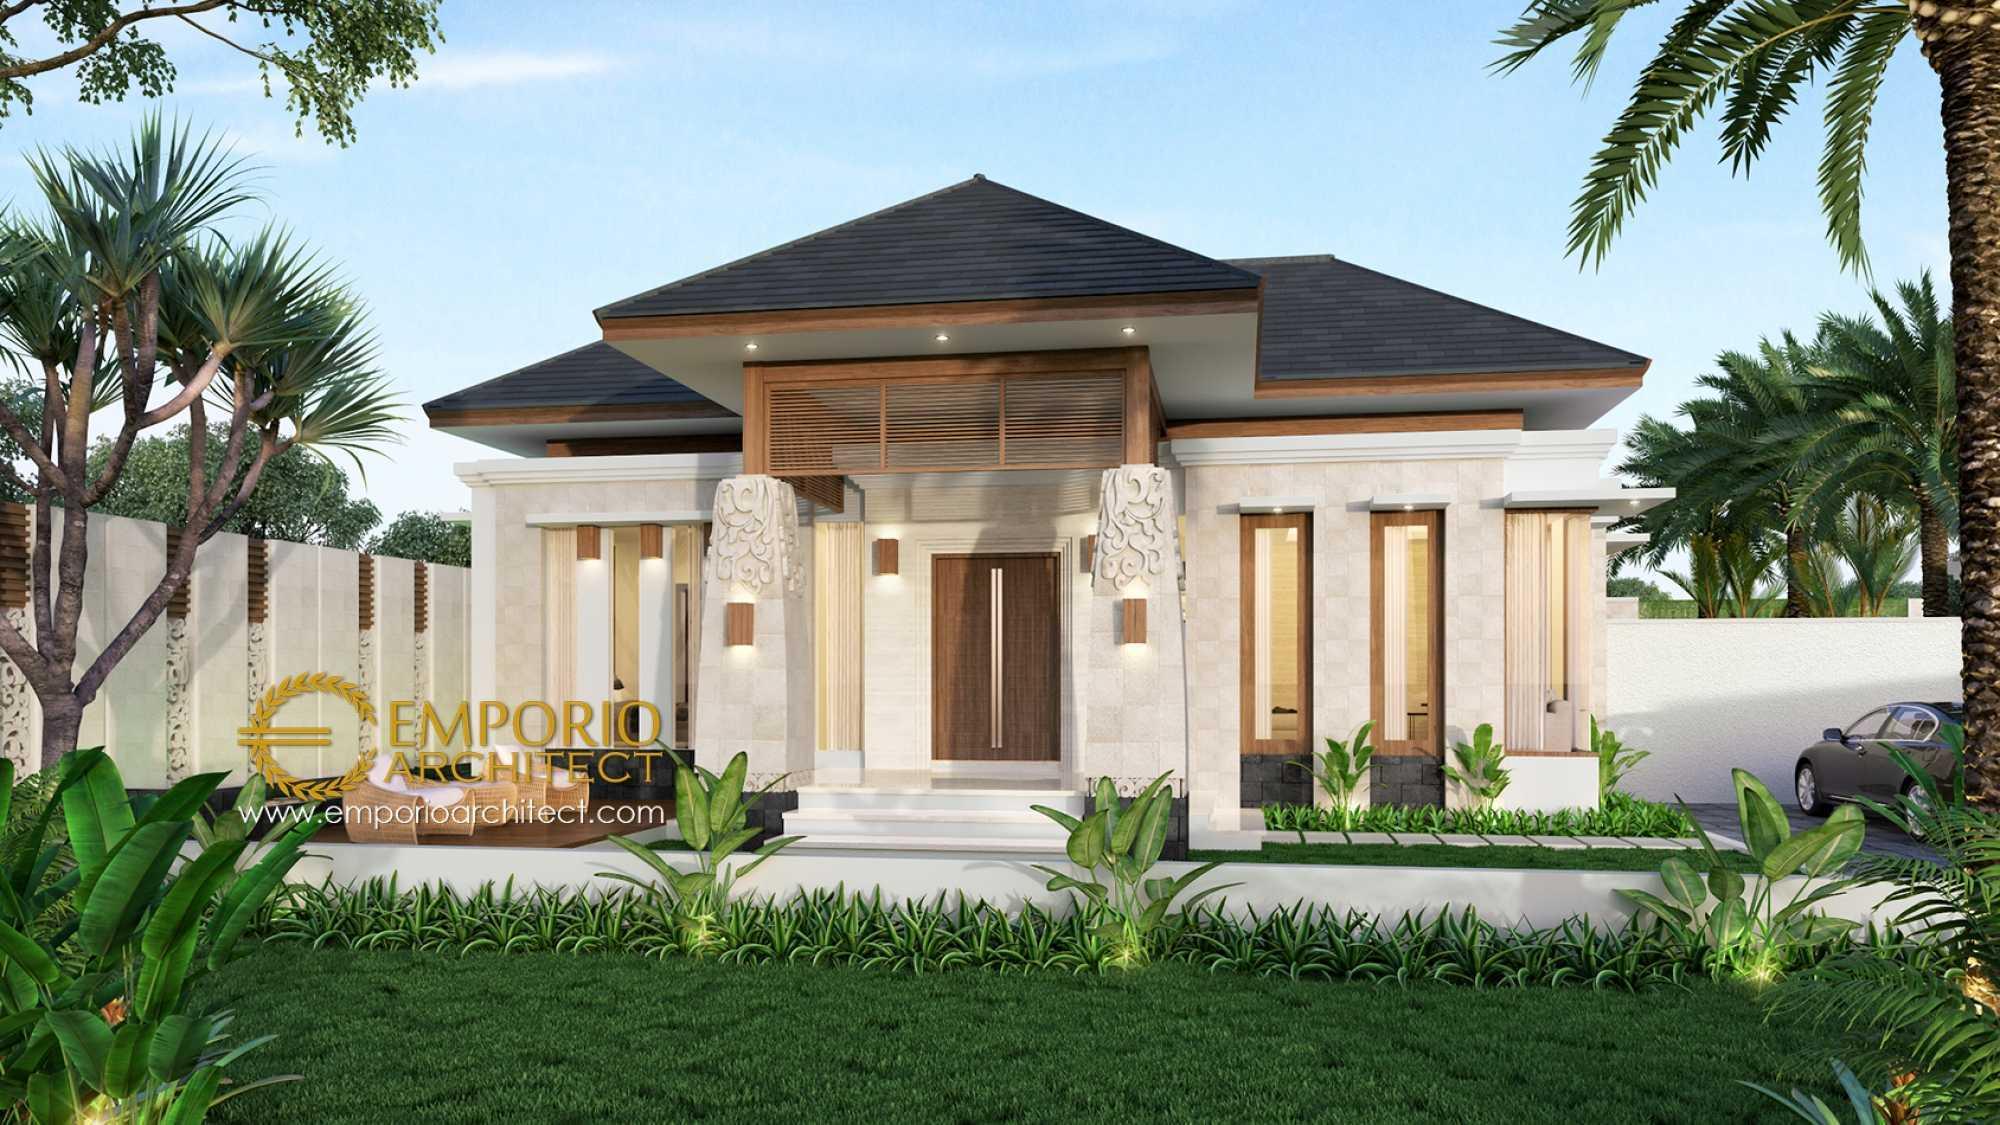 Emporio Architect Desain Rumah Villa Bali Tropis 371 @ Aceh Aceh, Indonesia Aceh, Indonesia Emporio-Architect-Desain-Rumah-Villa-Bali-Tropis-371-Aceh Tropical 76151